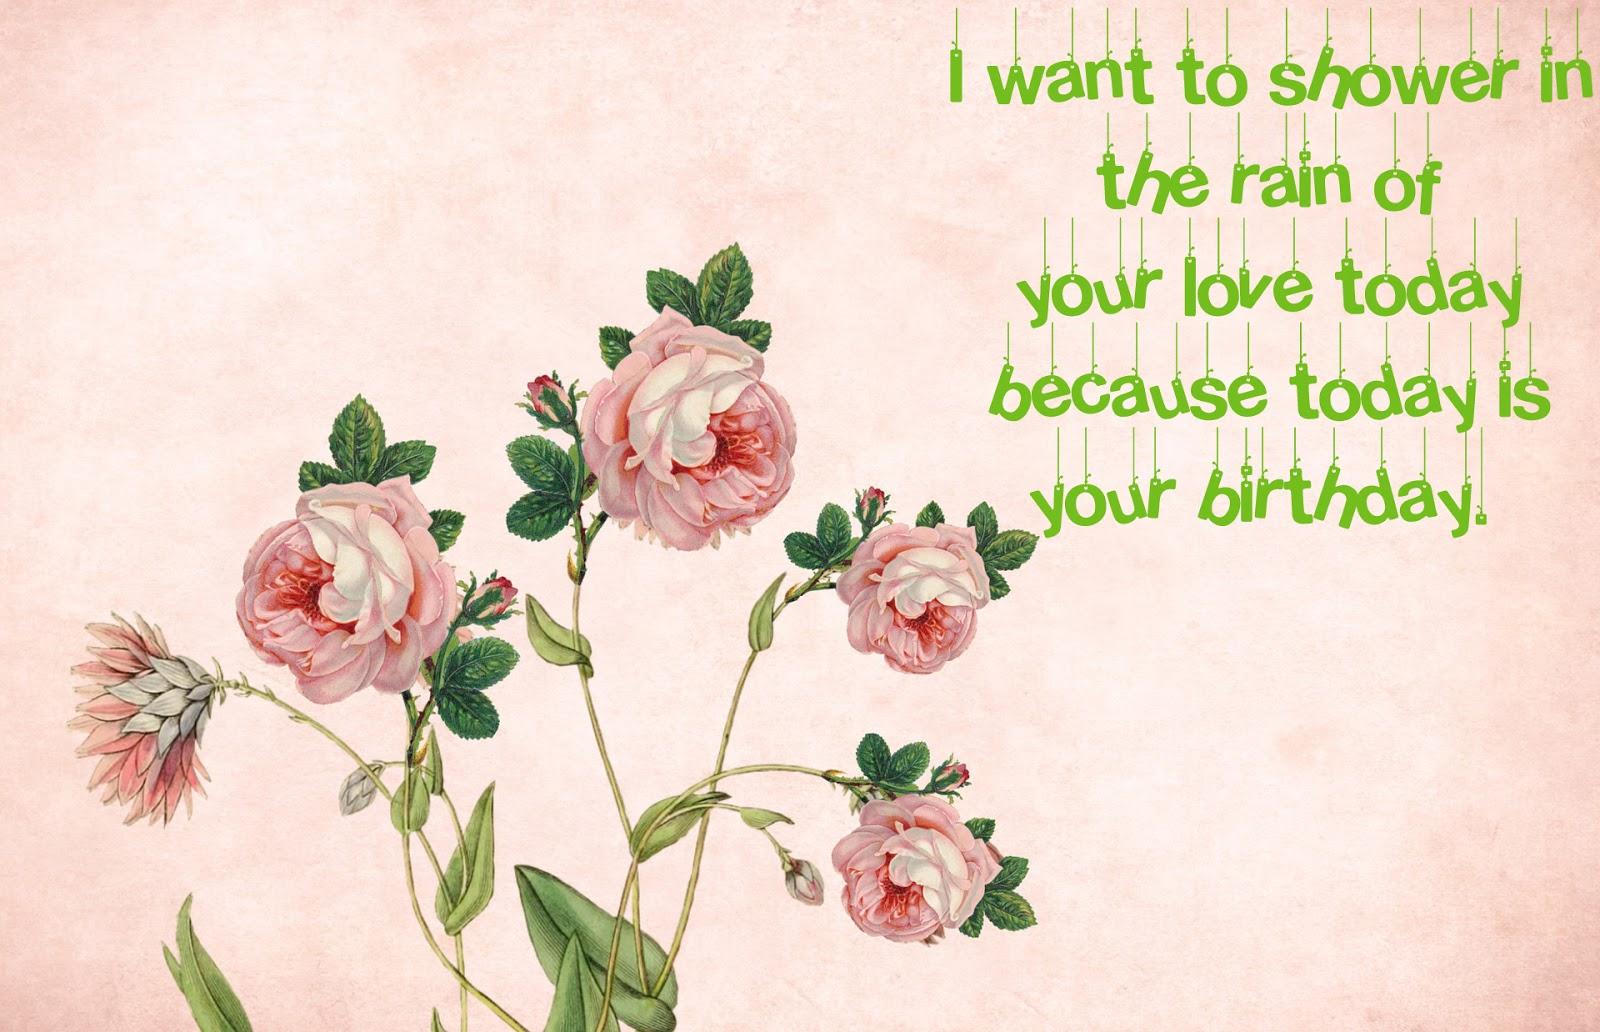 Hot birthday wishes for girlfriend